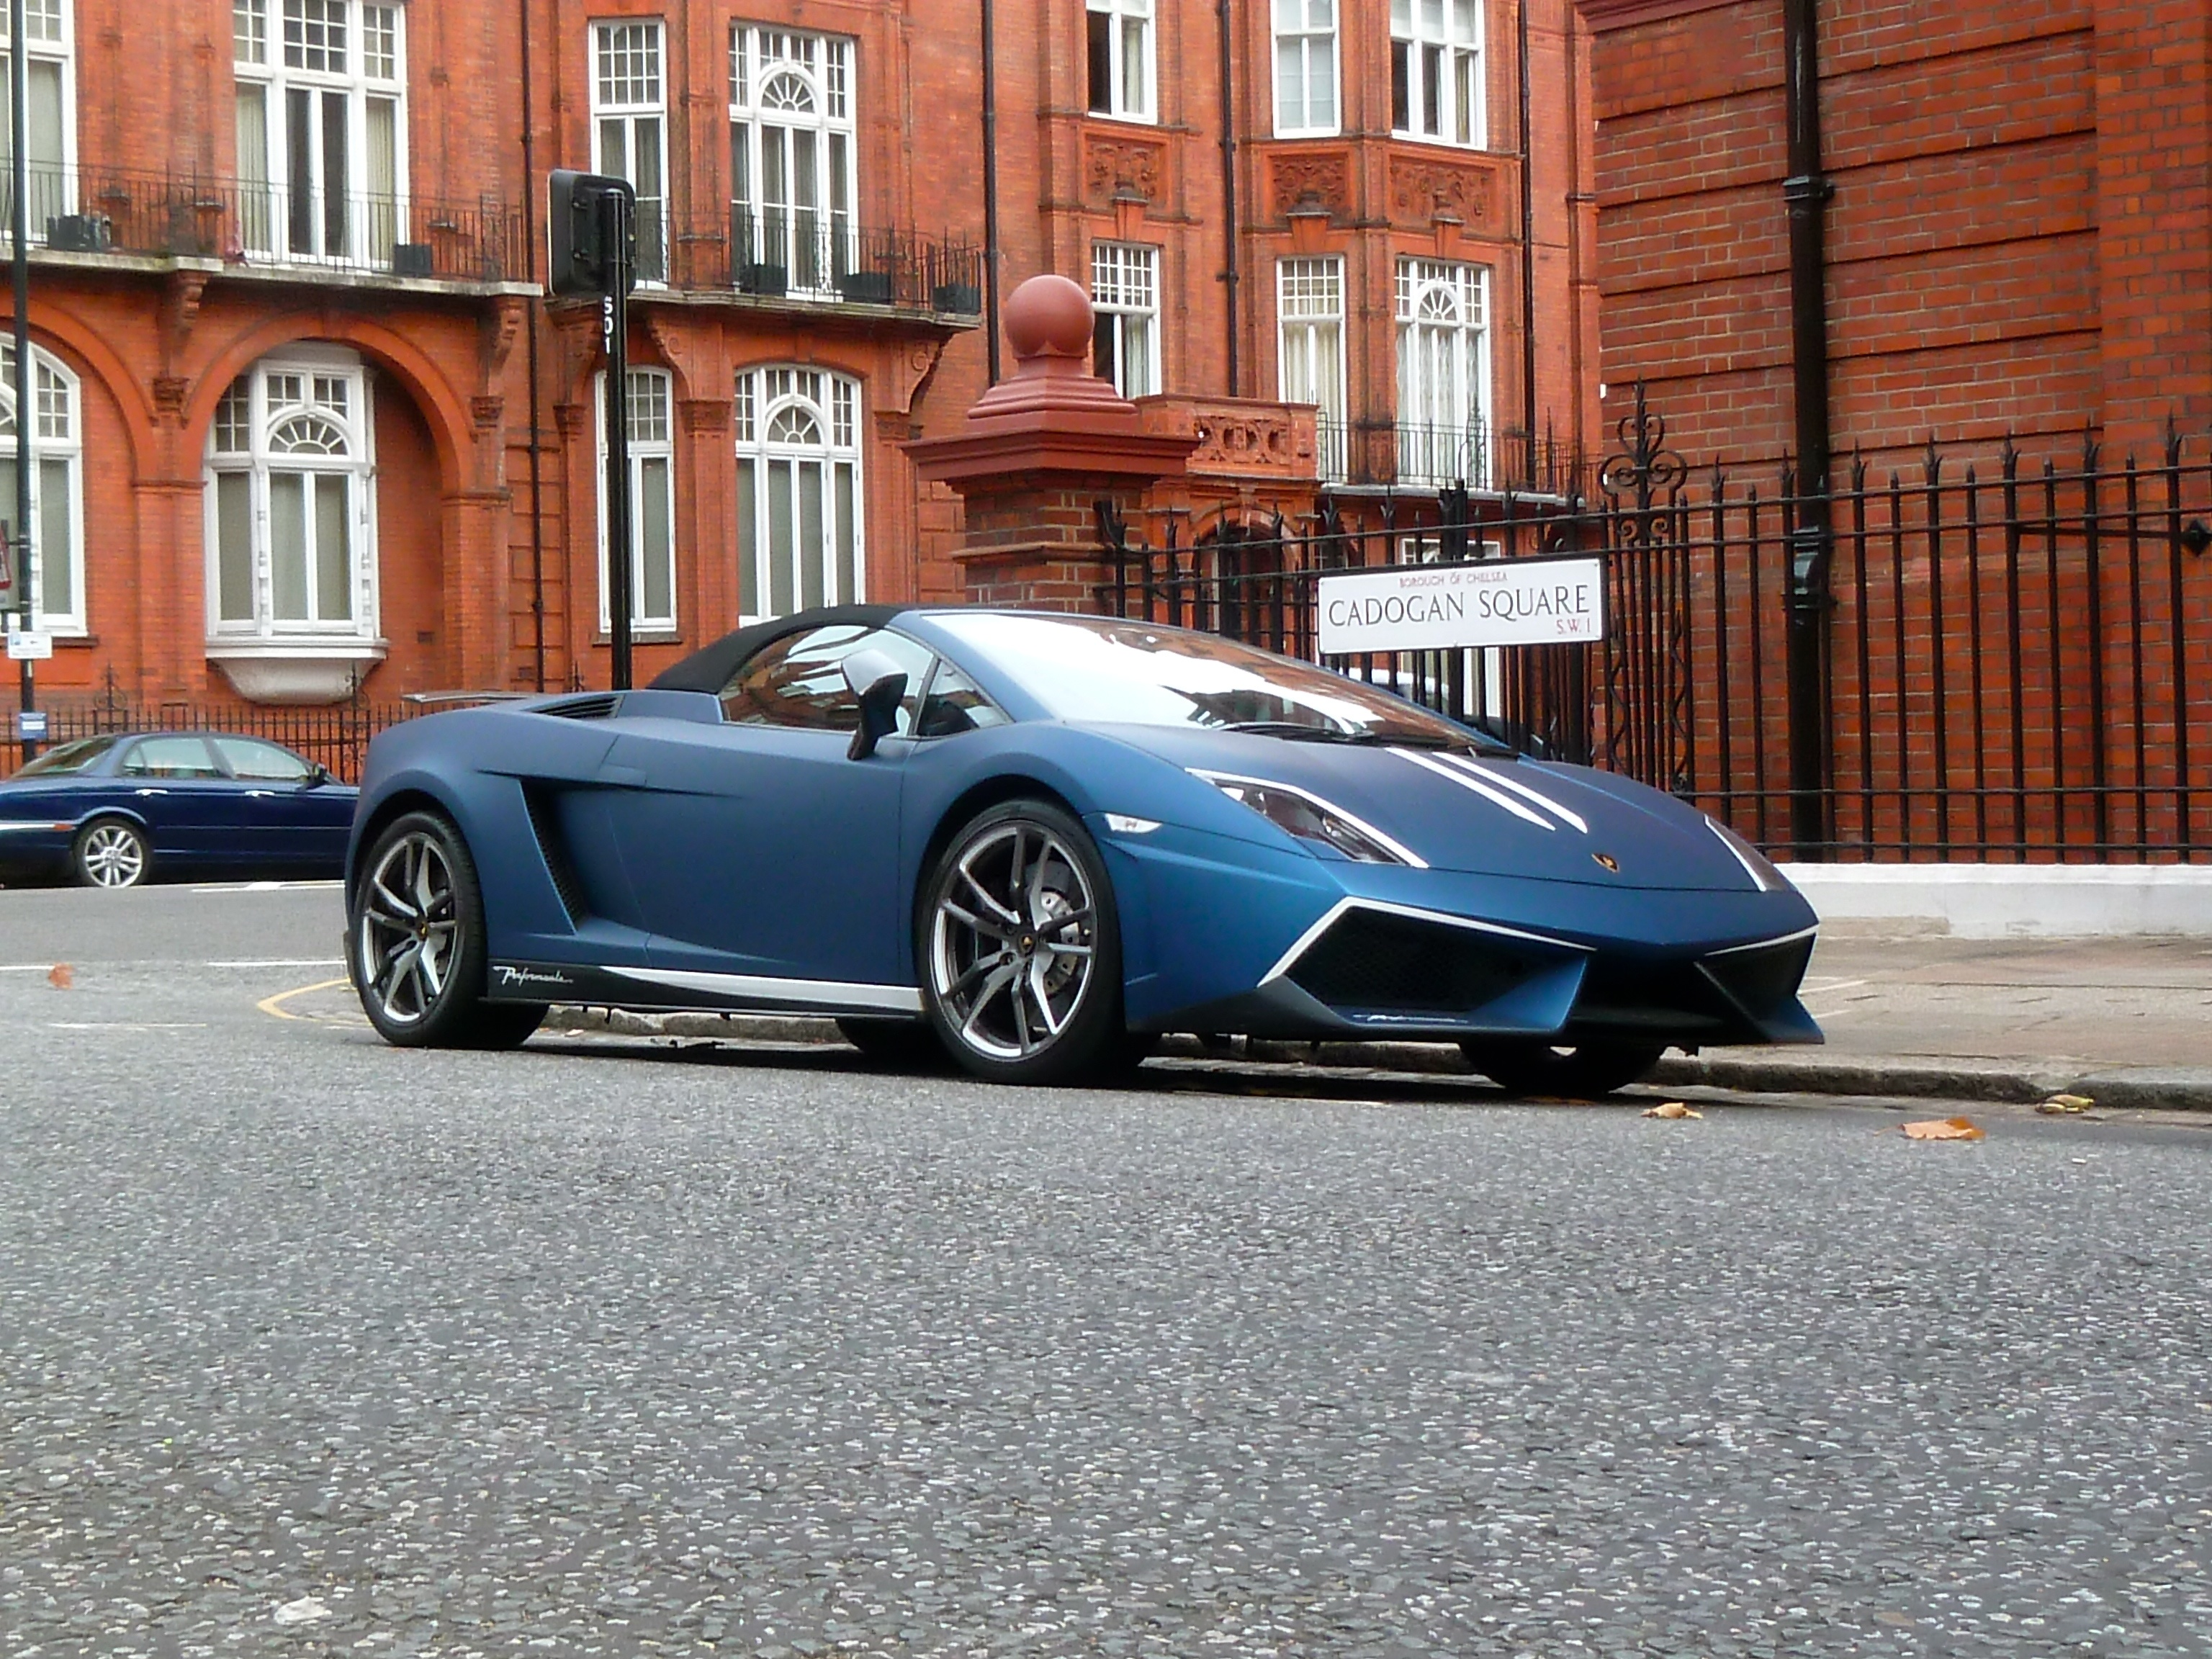 File Lamborghini Gallardo Lp570 4 Spyder Performante Ben In London